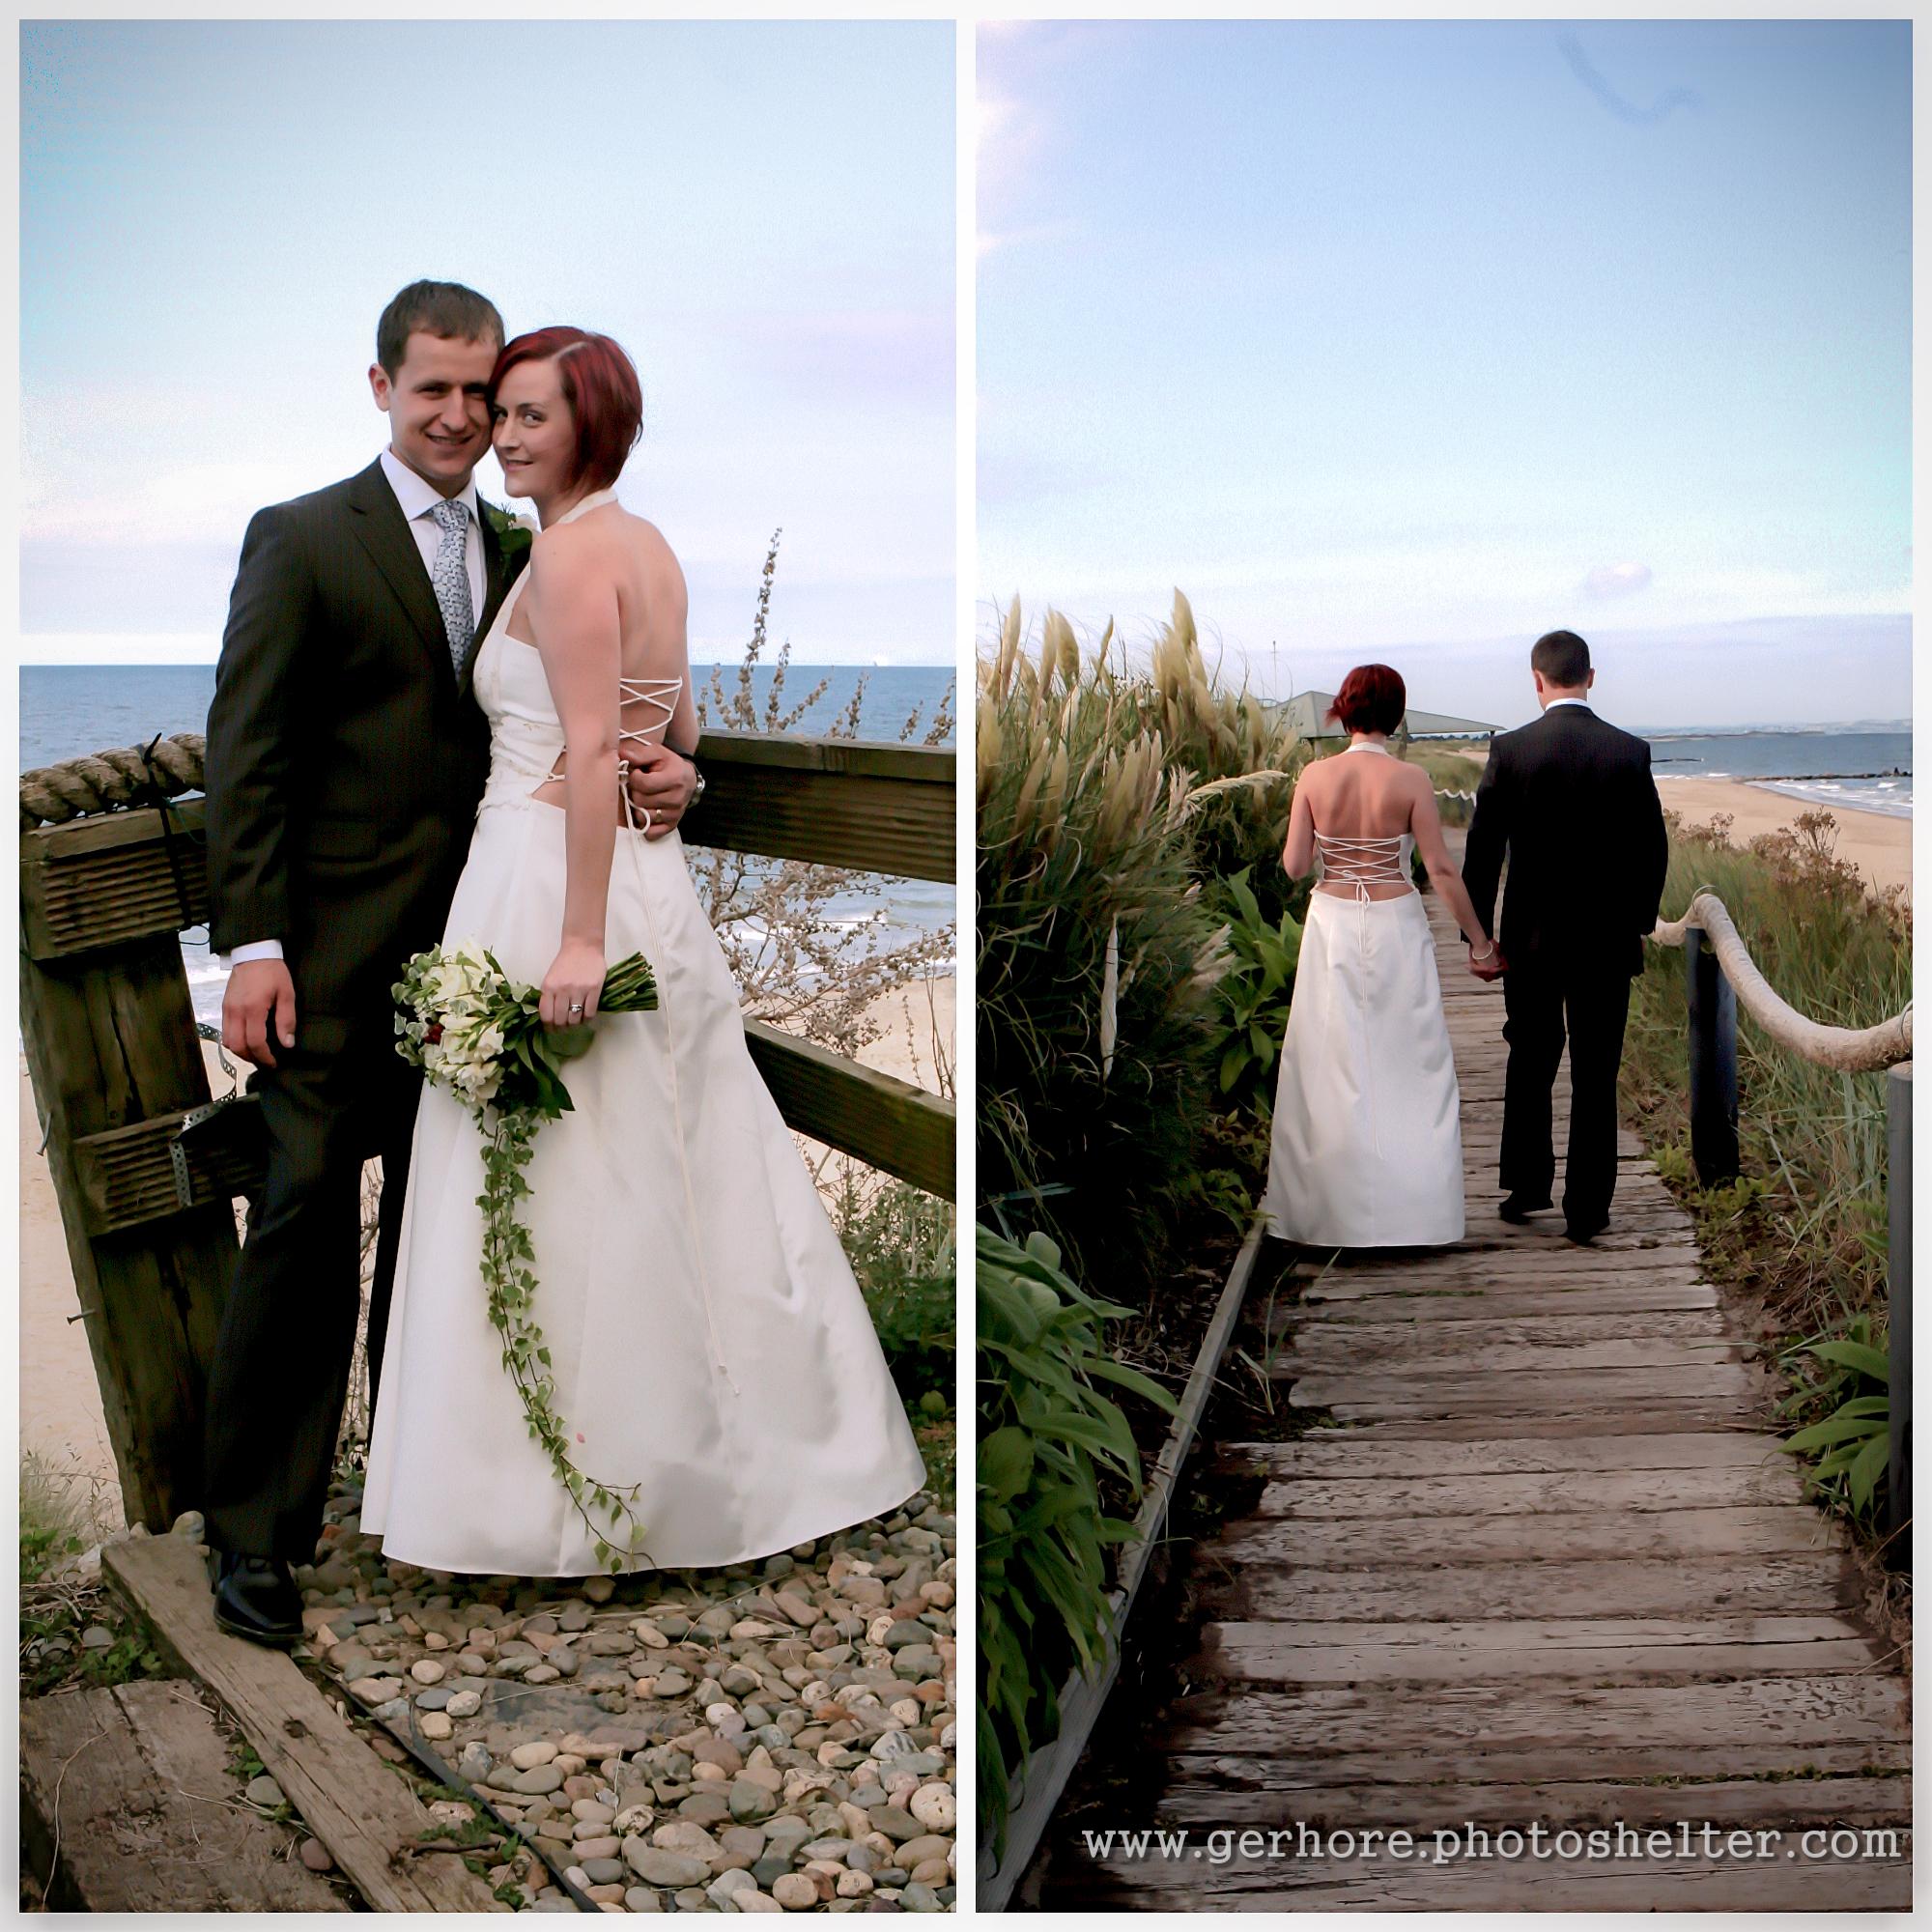 Wedding Photo | www.myfoododyssey.com